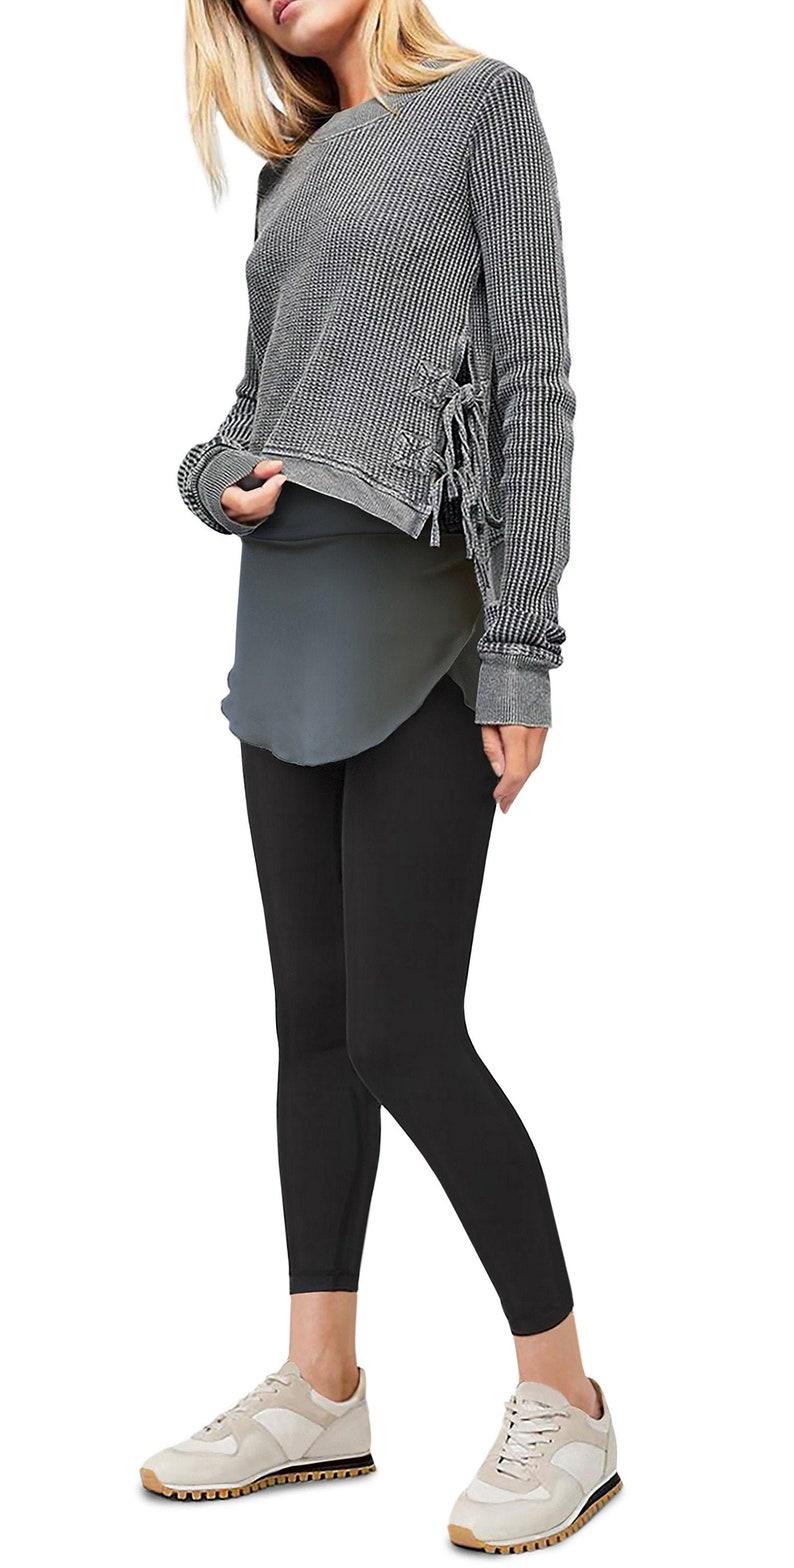 Granite Isabella Booty Shawl  shirt extender pixie skirt image 0